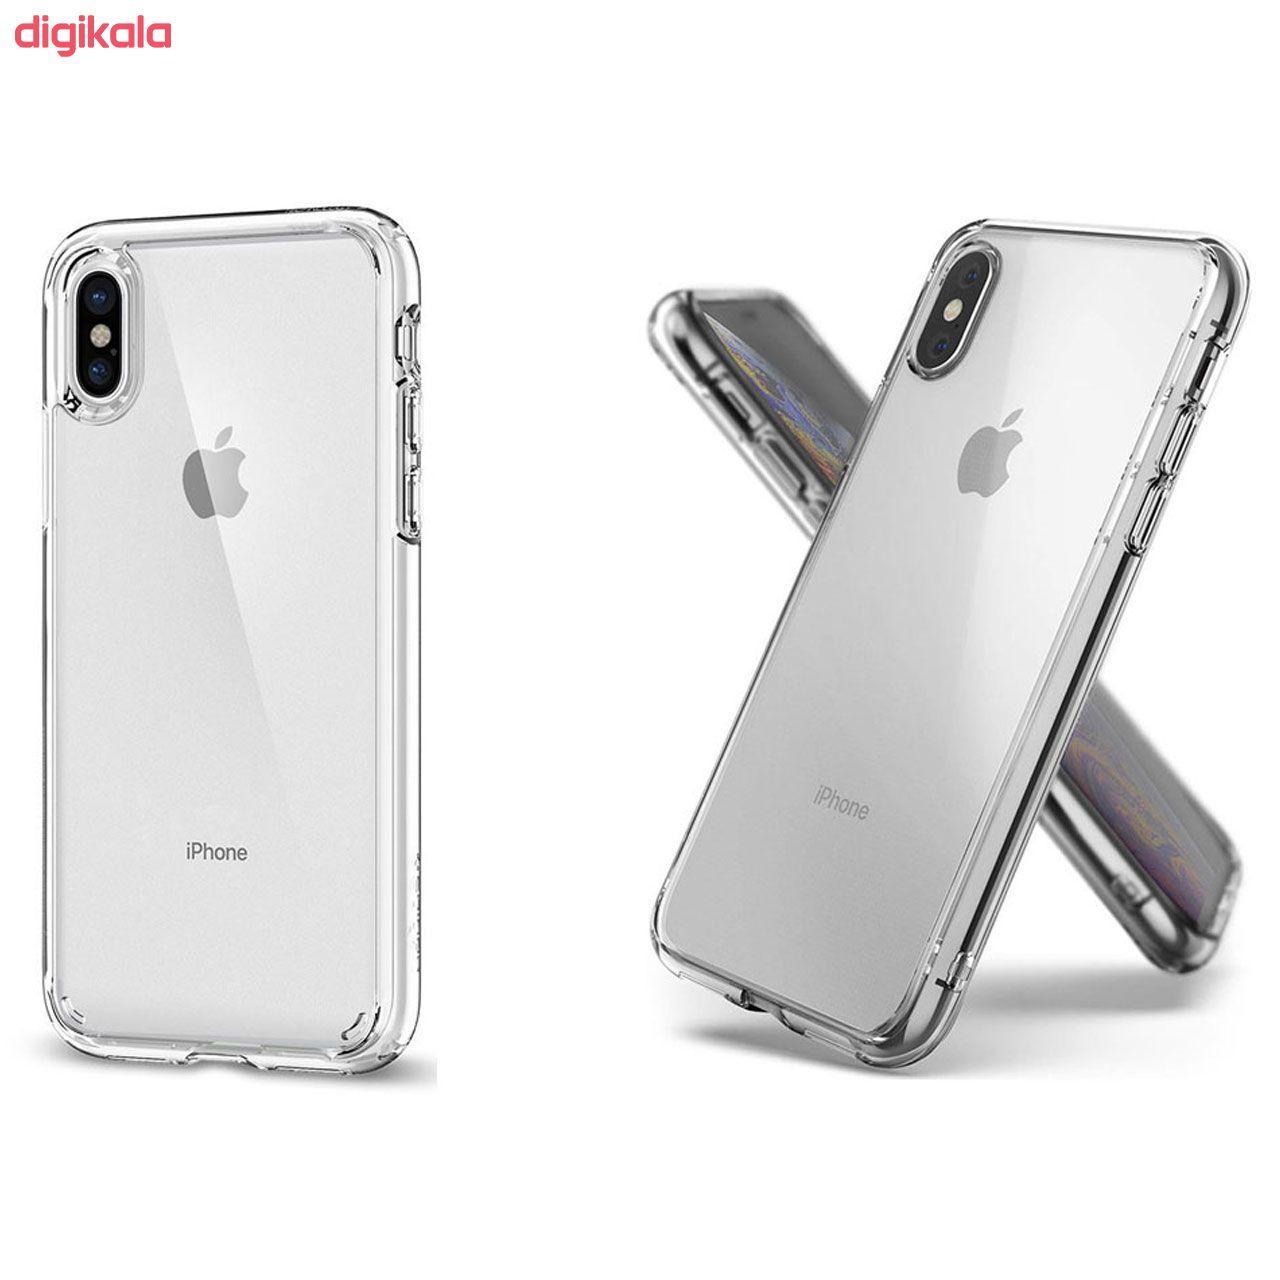 کاور مدل BLKN مناسب برای گوشی موبایل اپل iPhone XS Max main 1 9